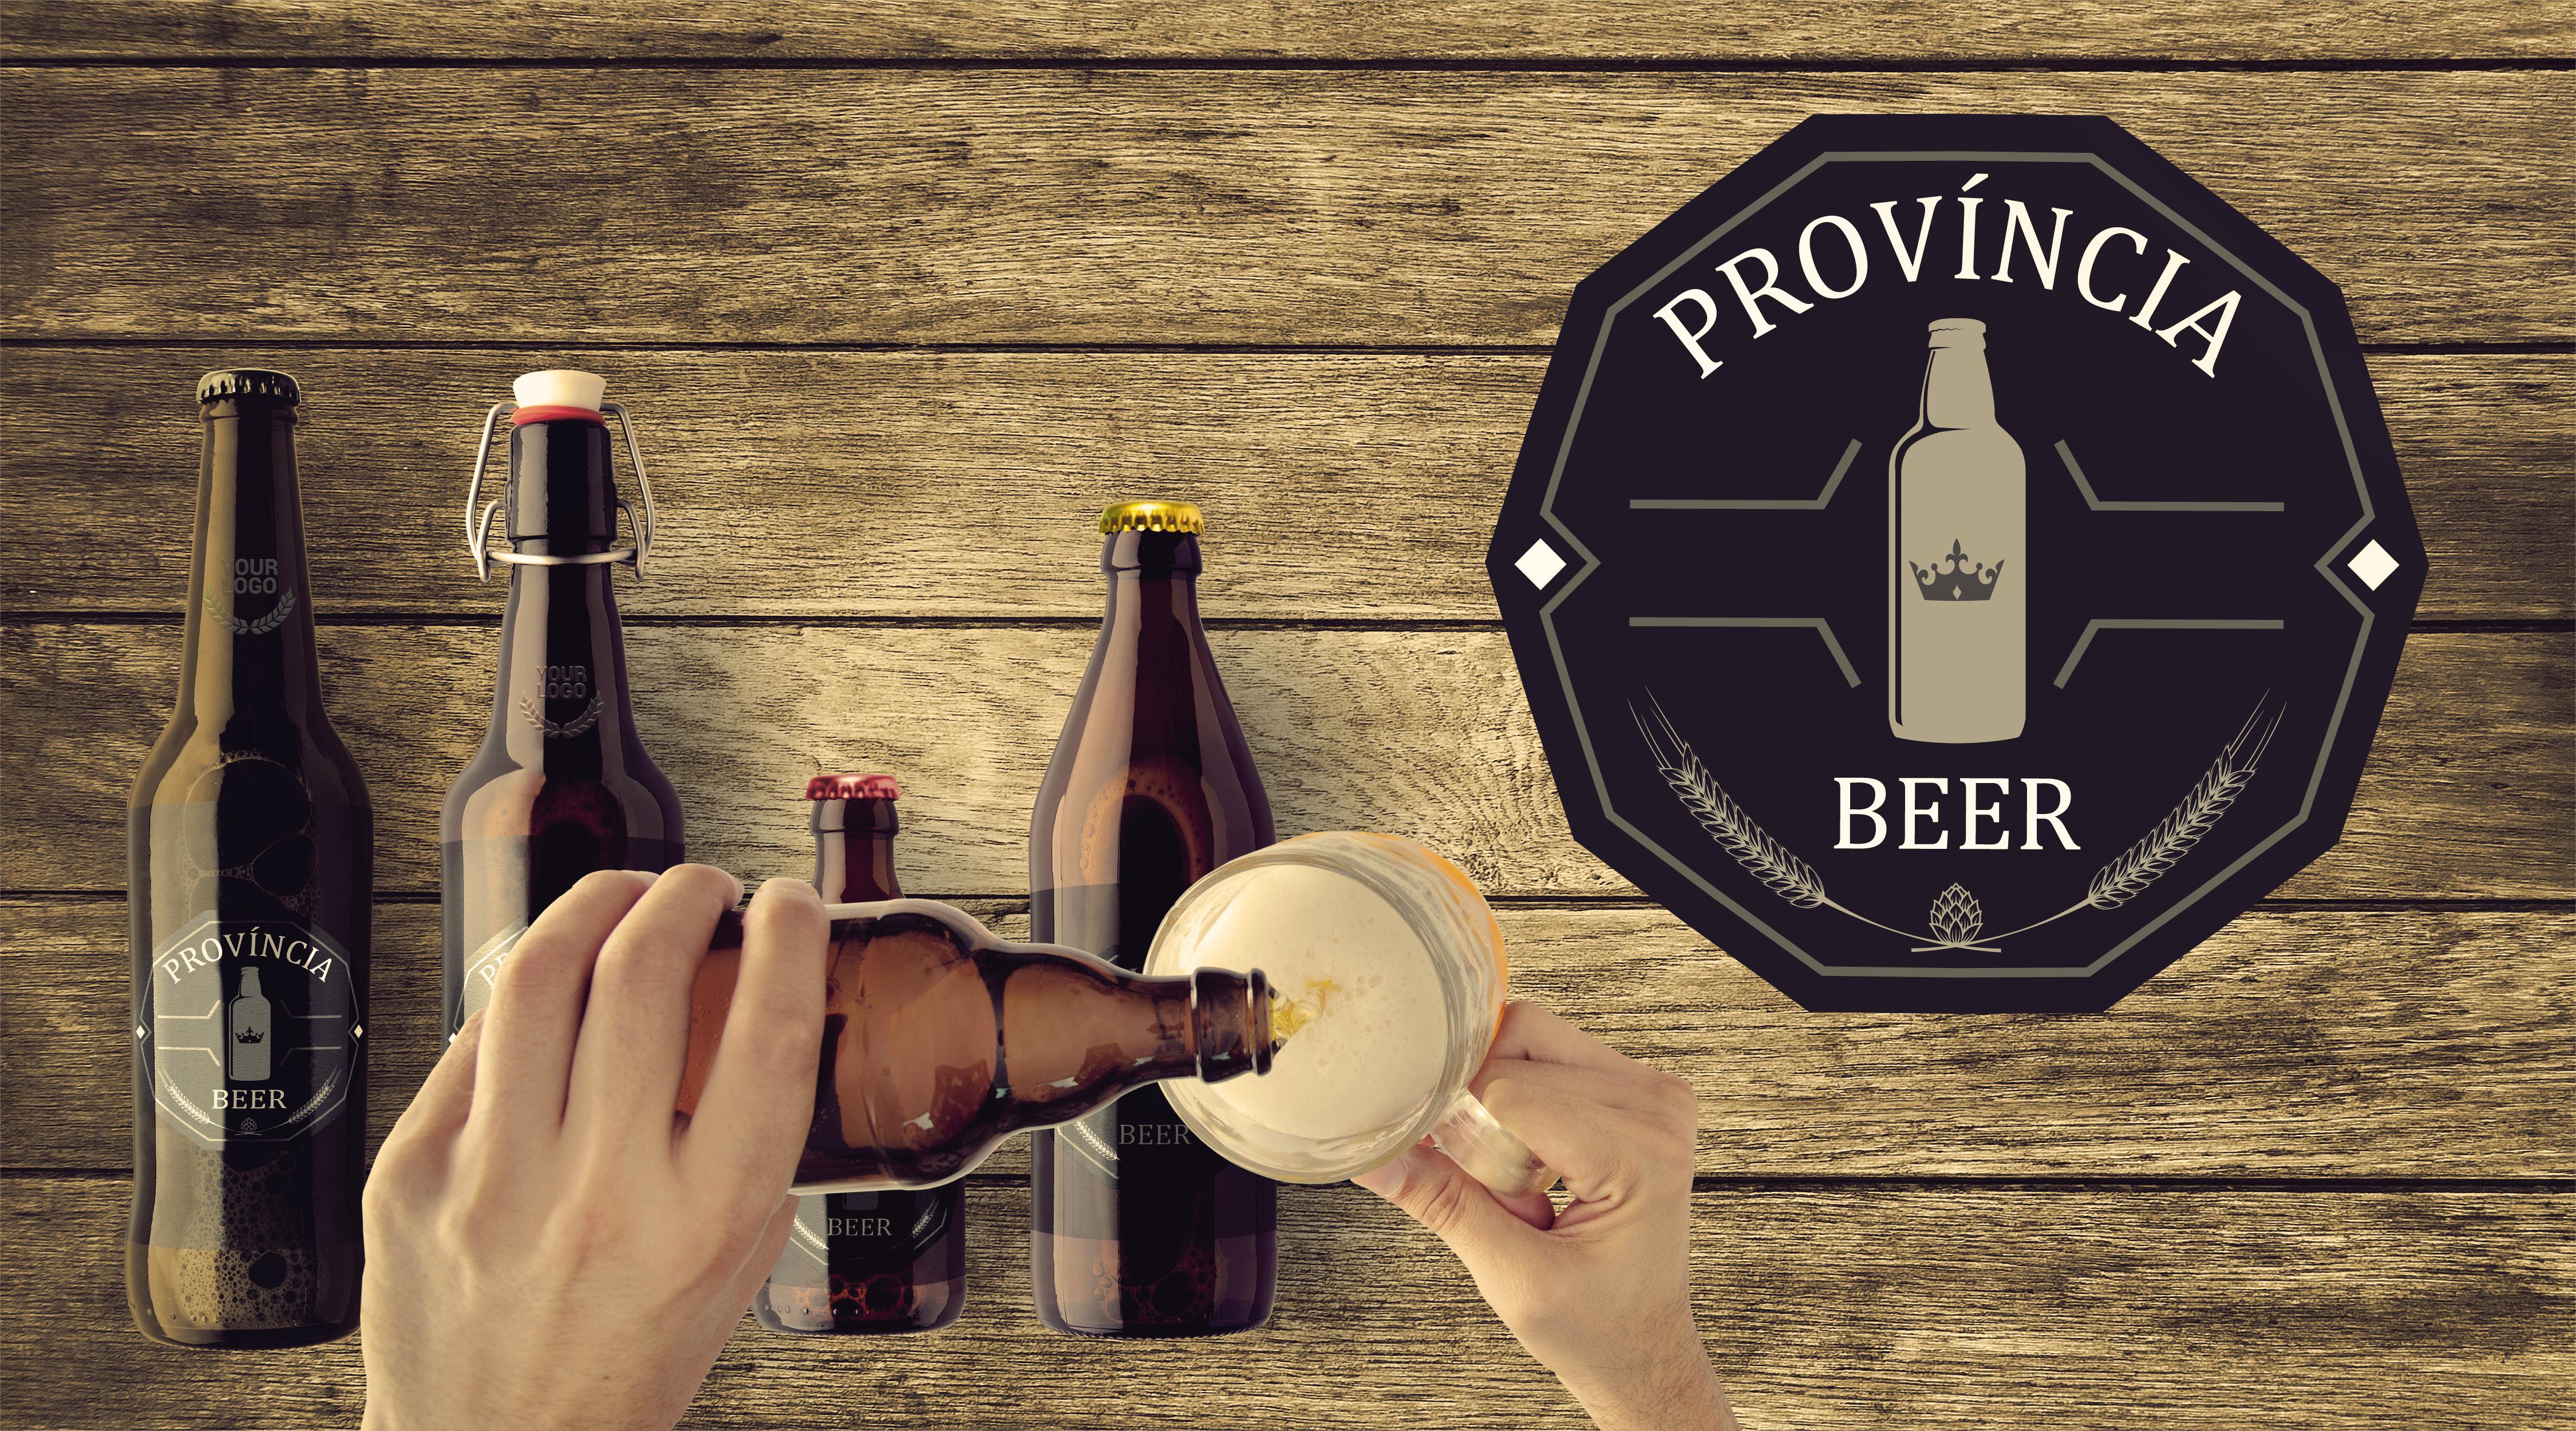 provincia beer